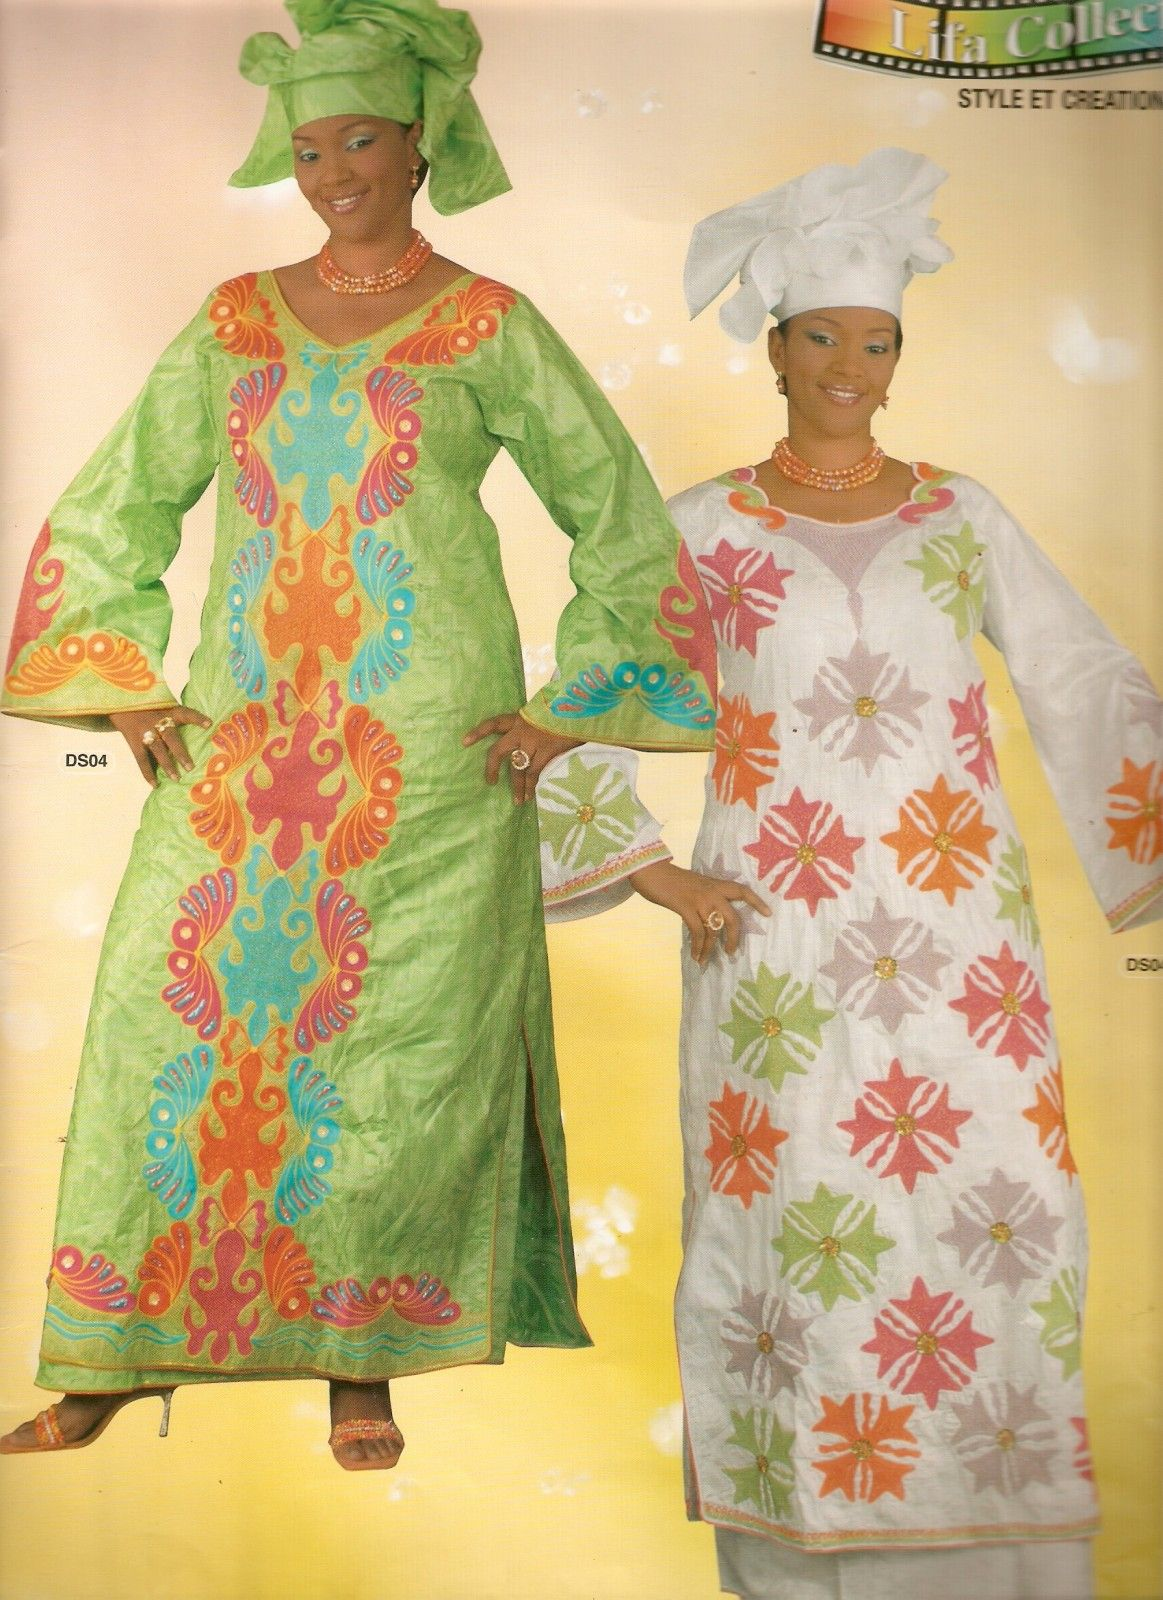 pagne africain modele haut - Recherche Google | Idées de mode, Robe africaine